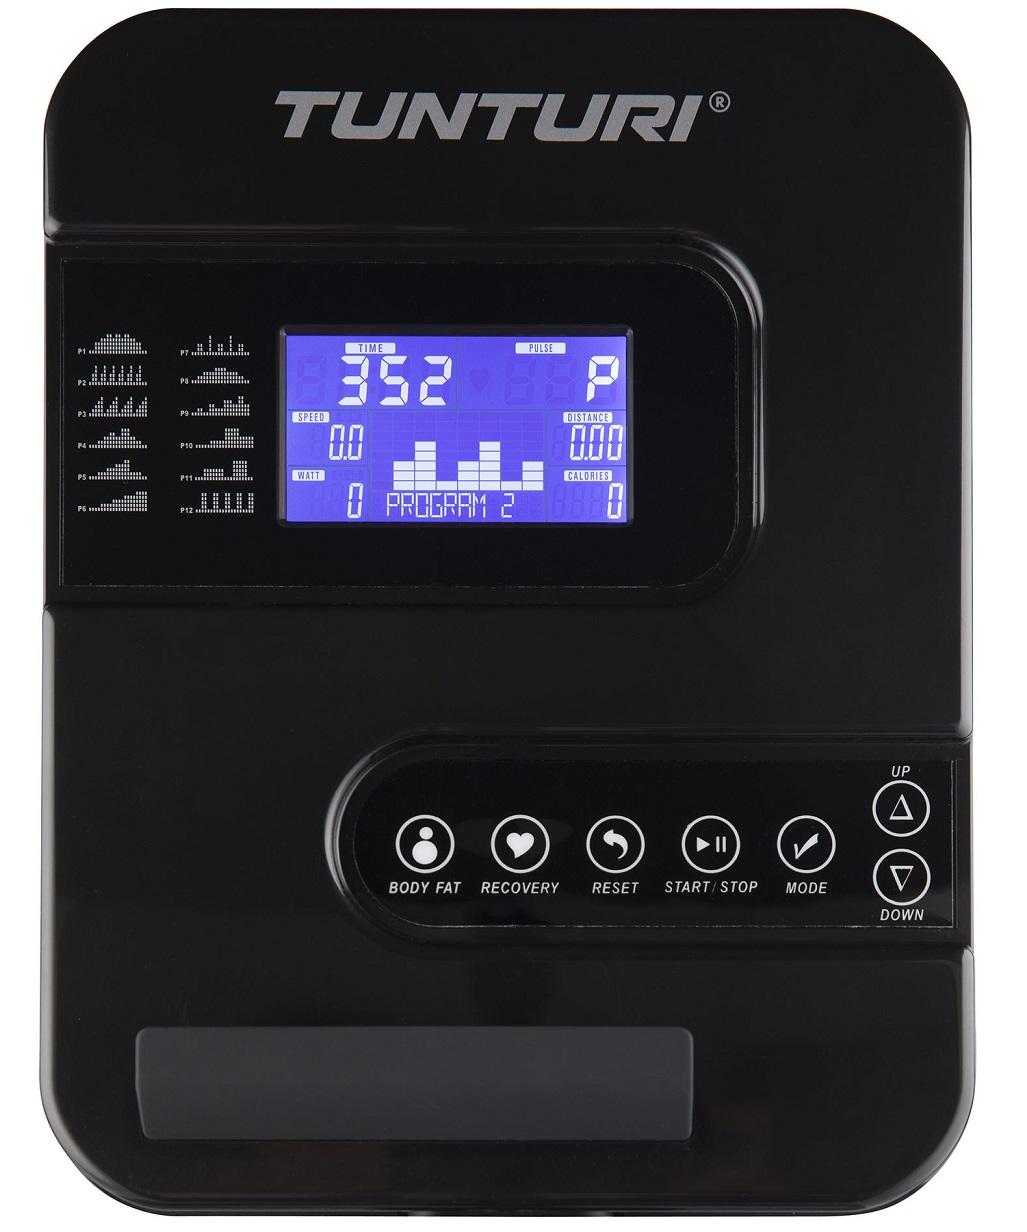 Eliptický trenažér Tunturi FitCross 40 počítač